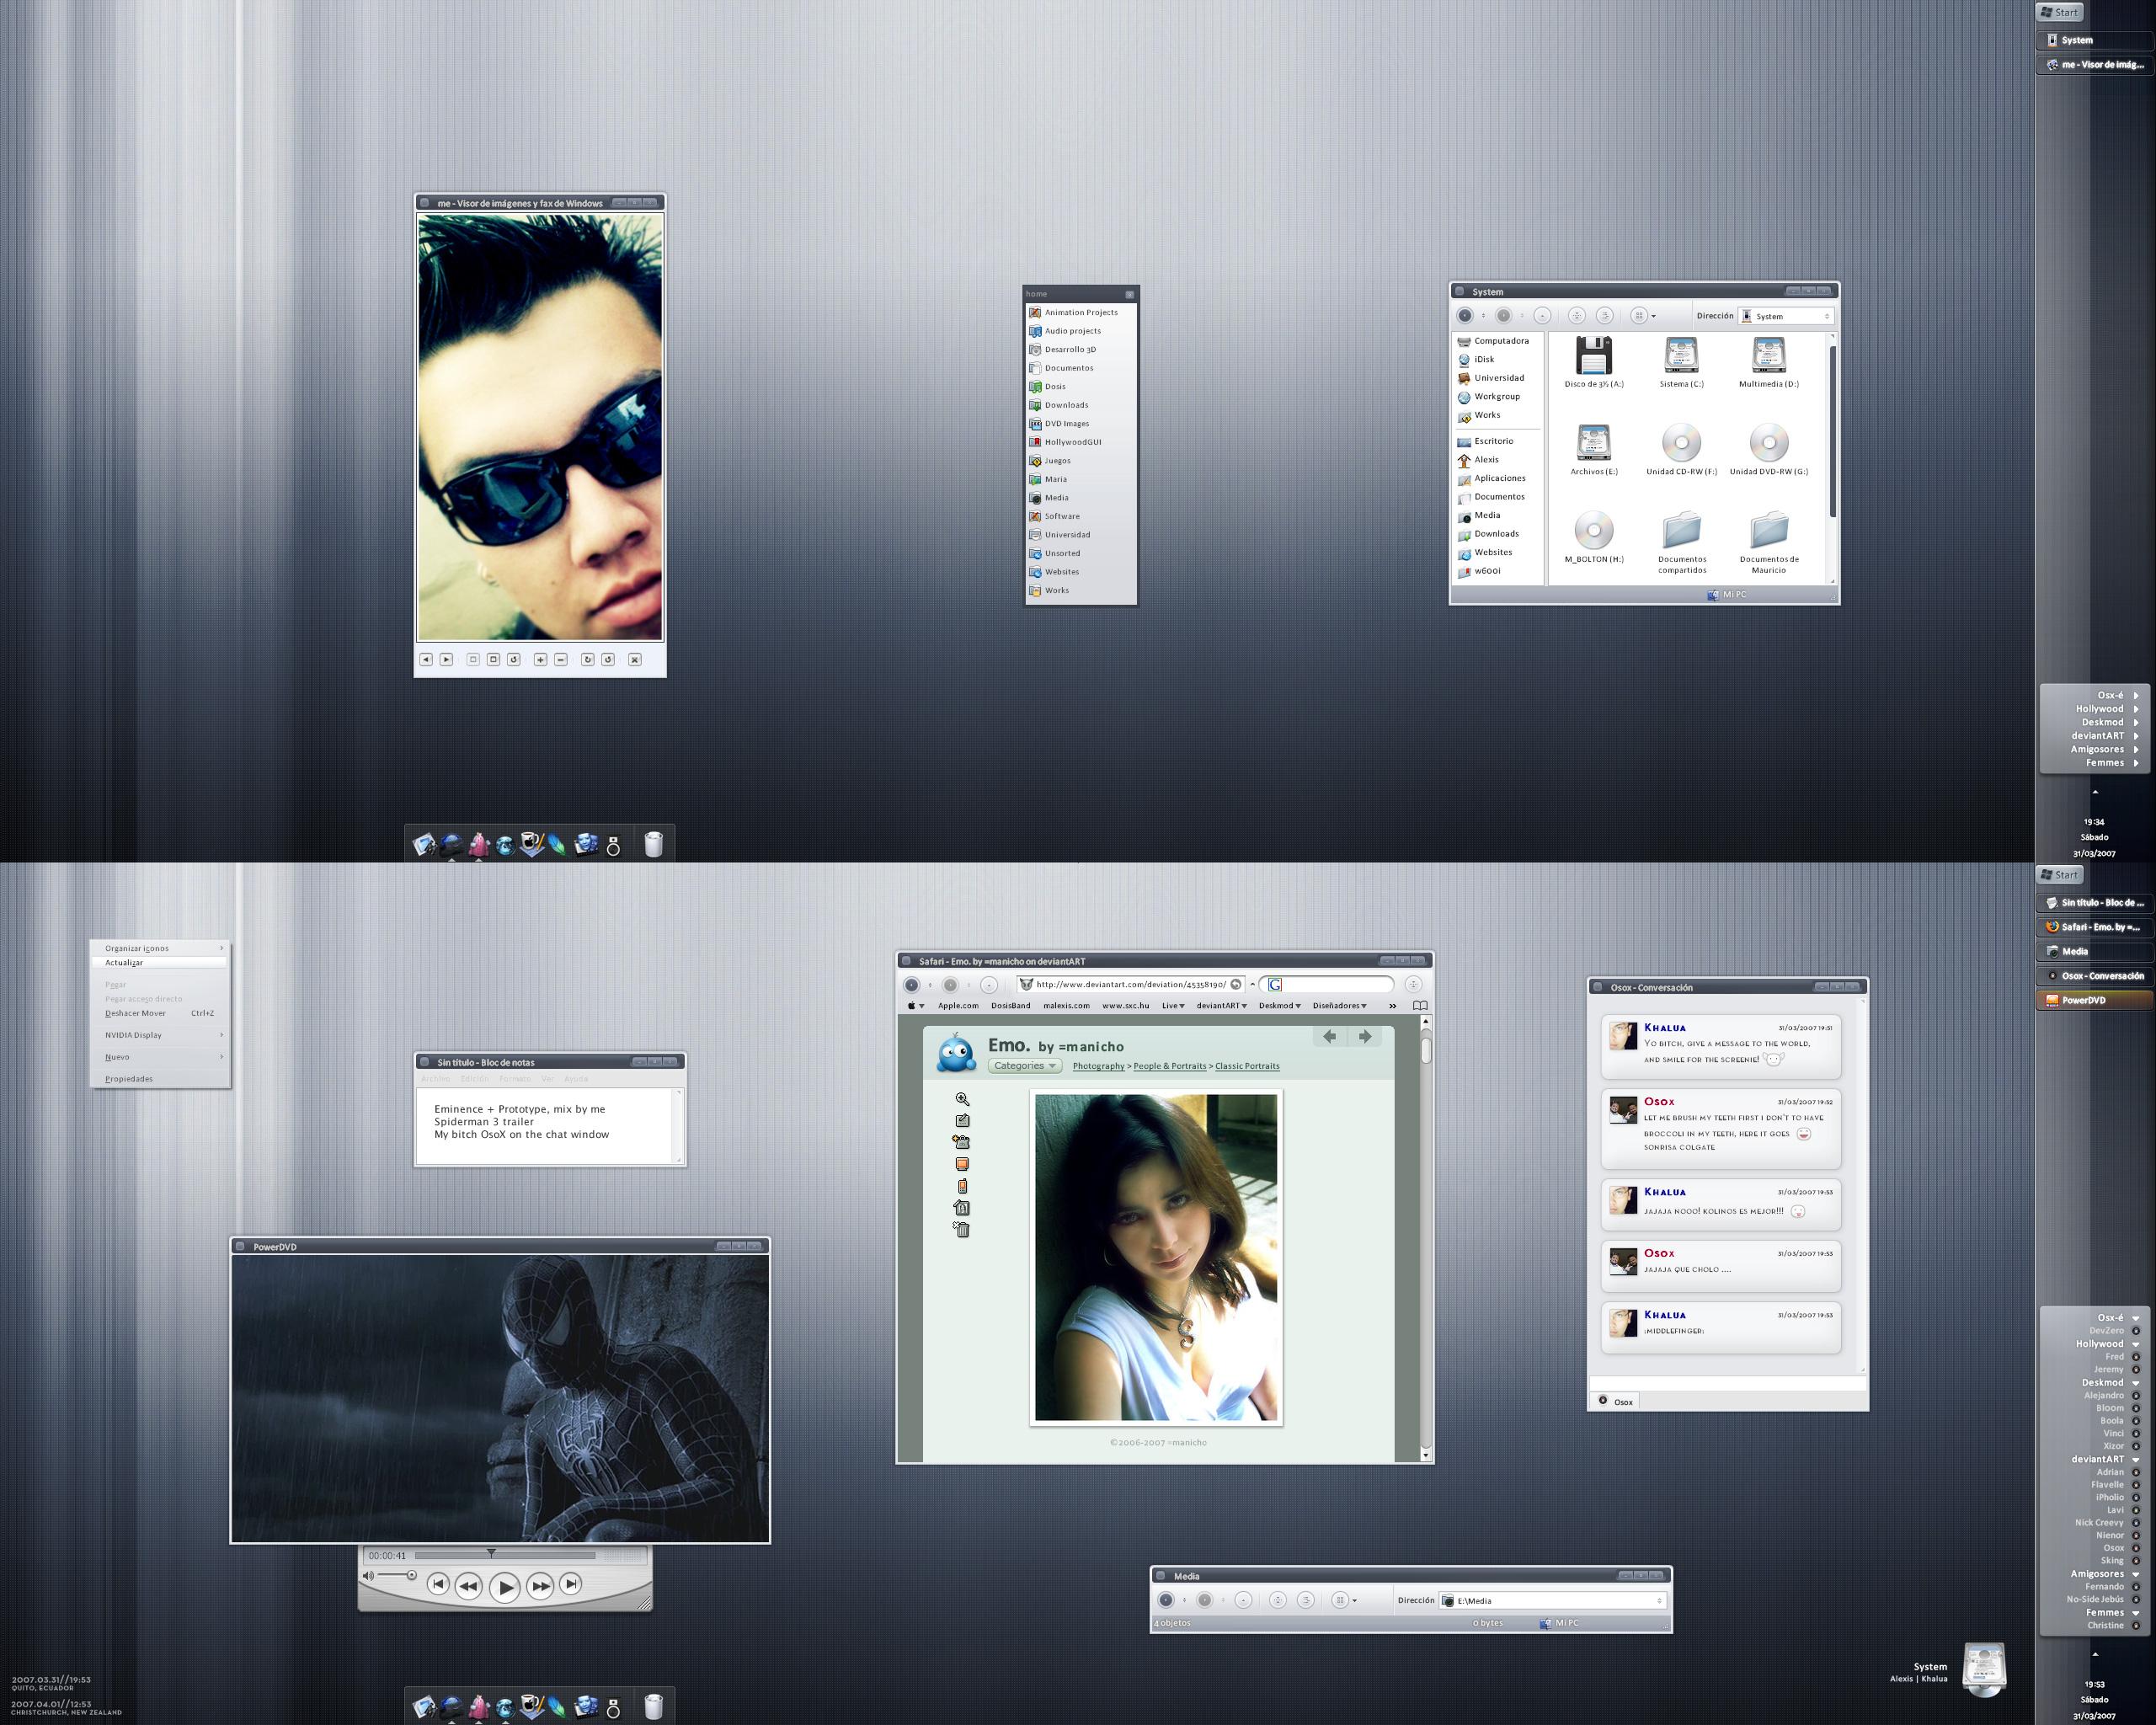 My 'Emitype' desktop by mauricioestrella